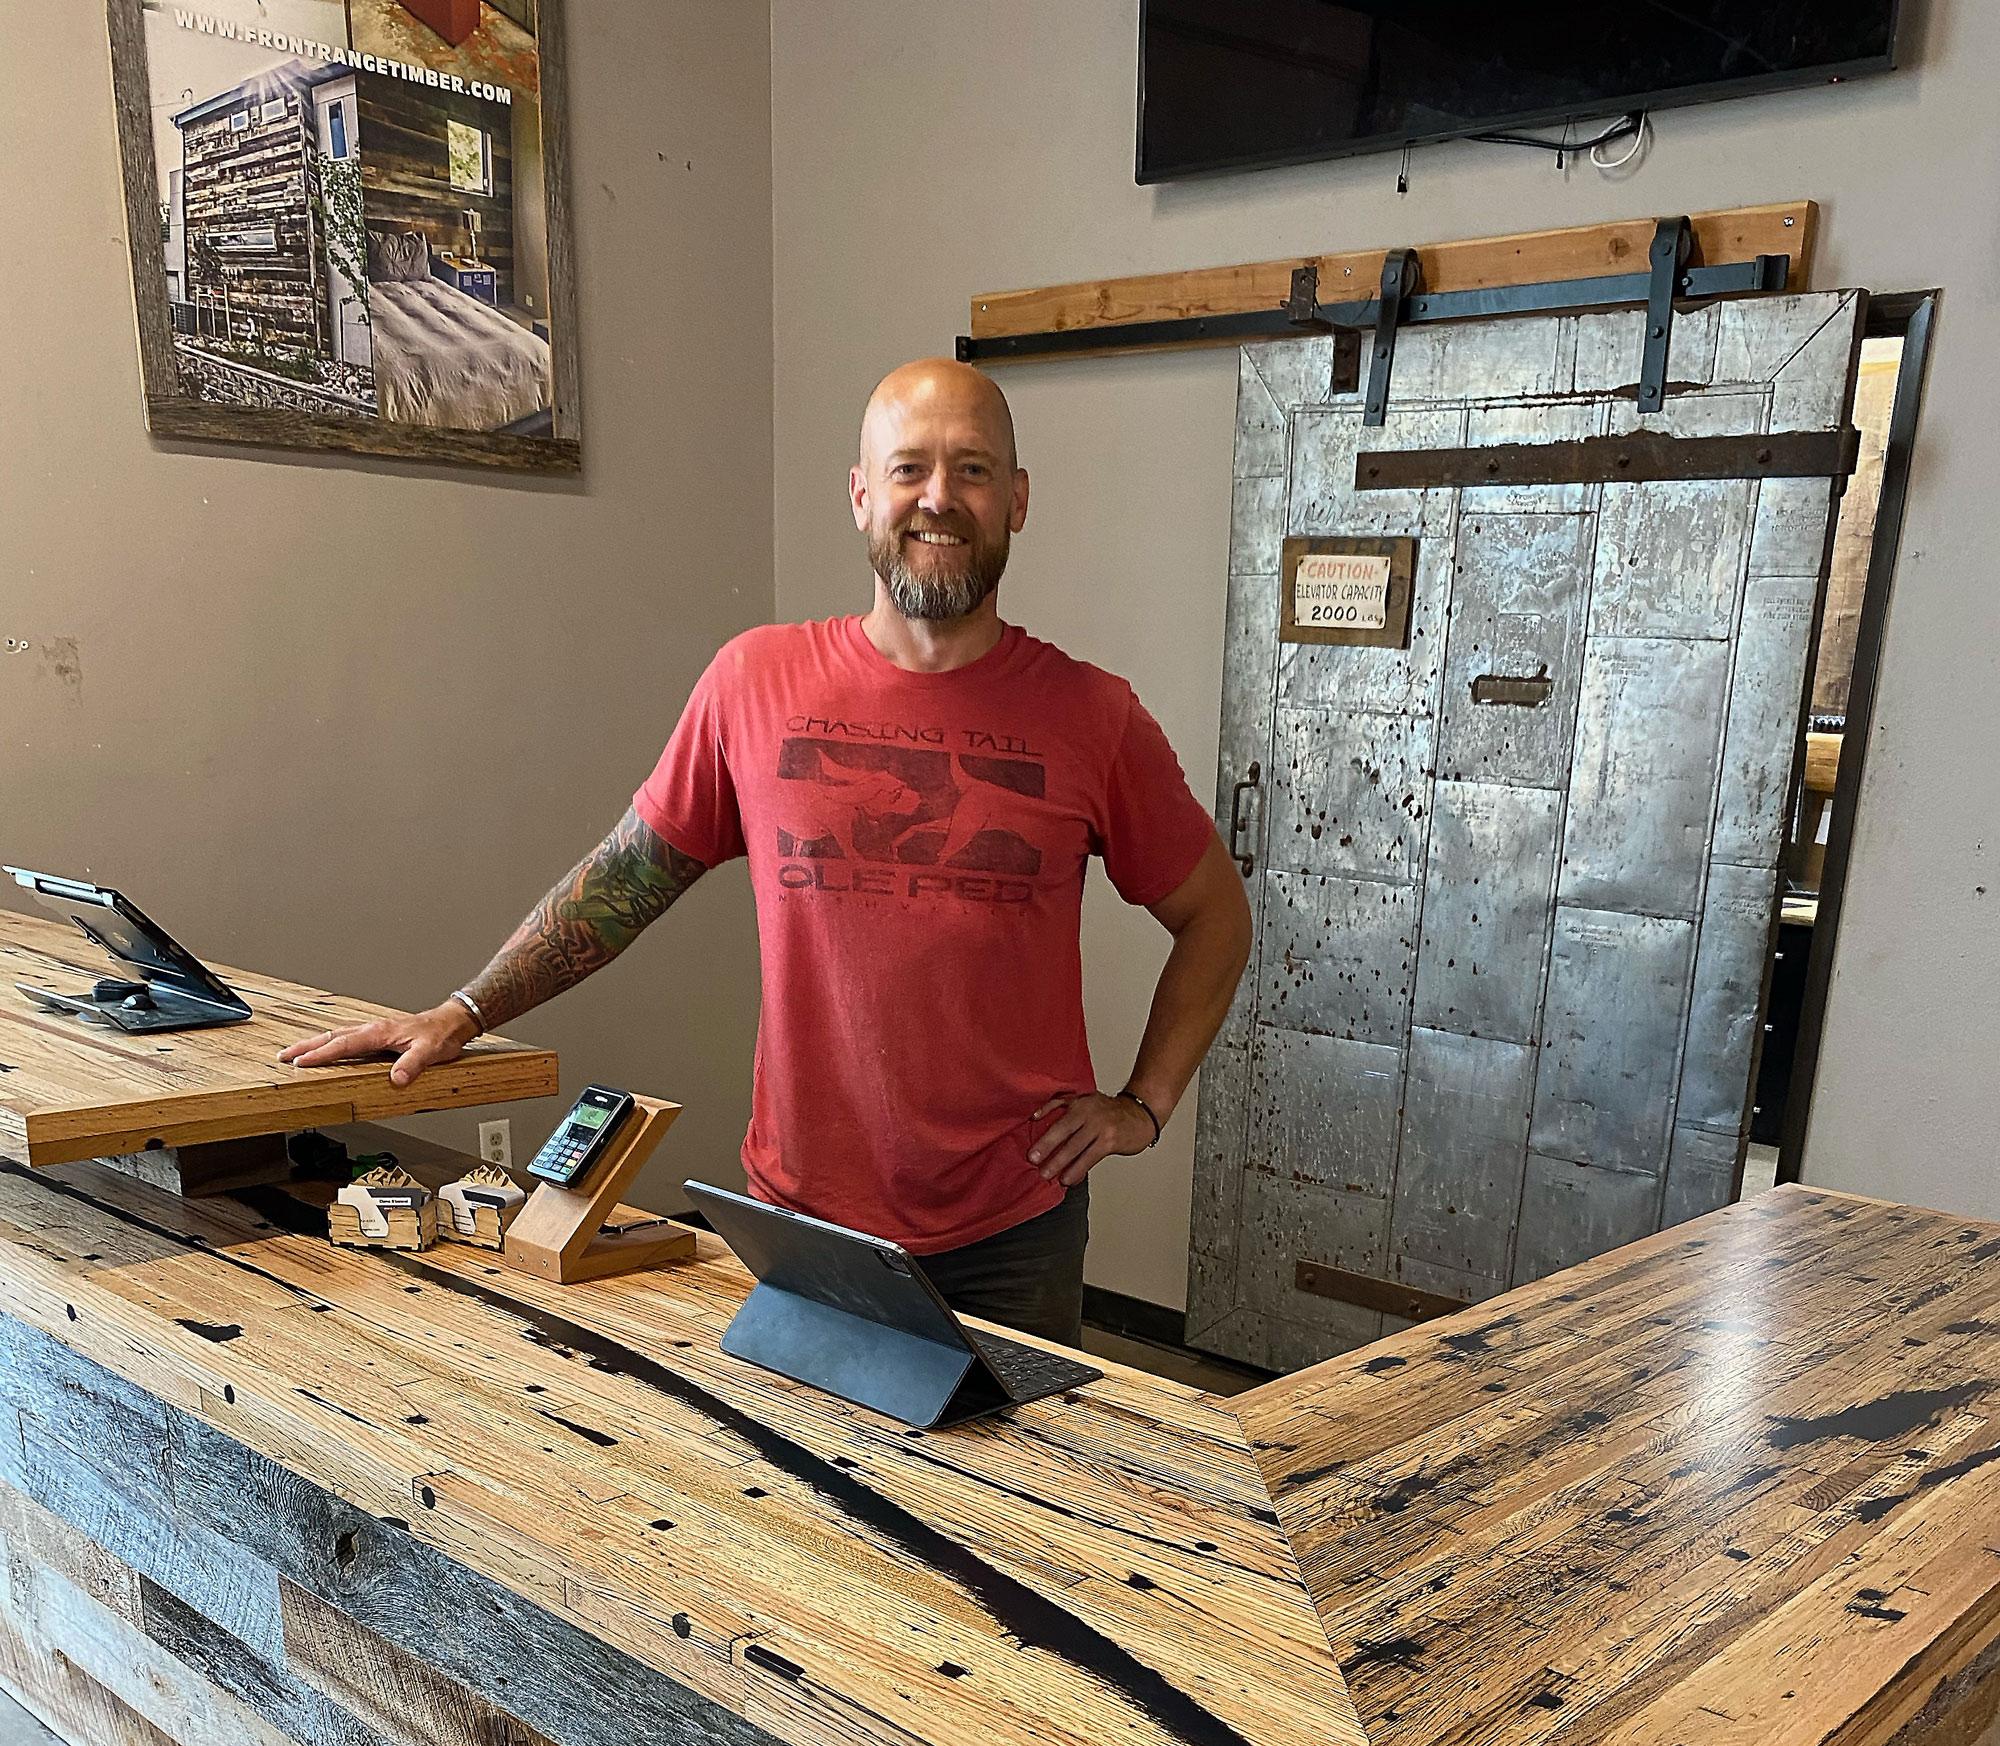 Greg Reinhardt-Ruprecht, owner Front Range Timber